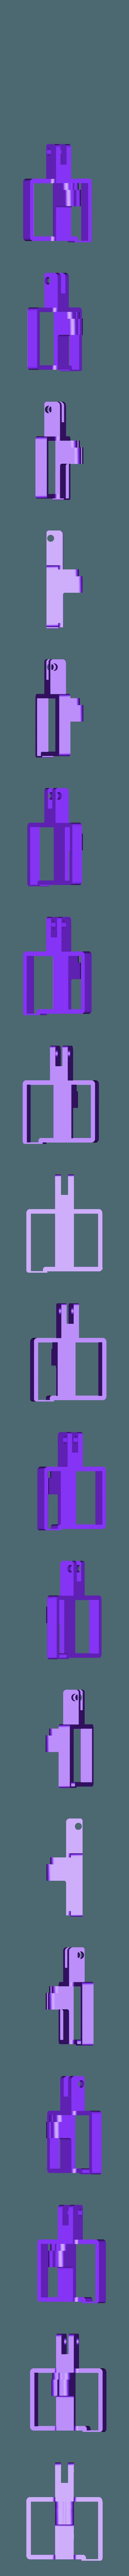 Dial Holder Master-03.STL Download free STL file CR-10 Dial Indicator Mount • 3D printer model, Trikonics